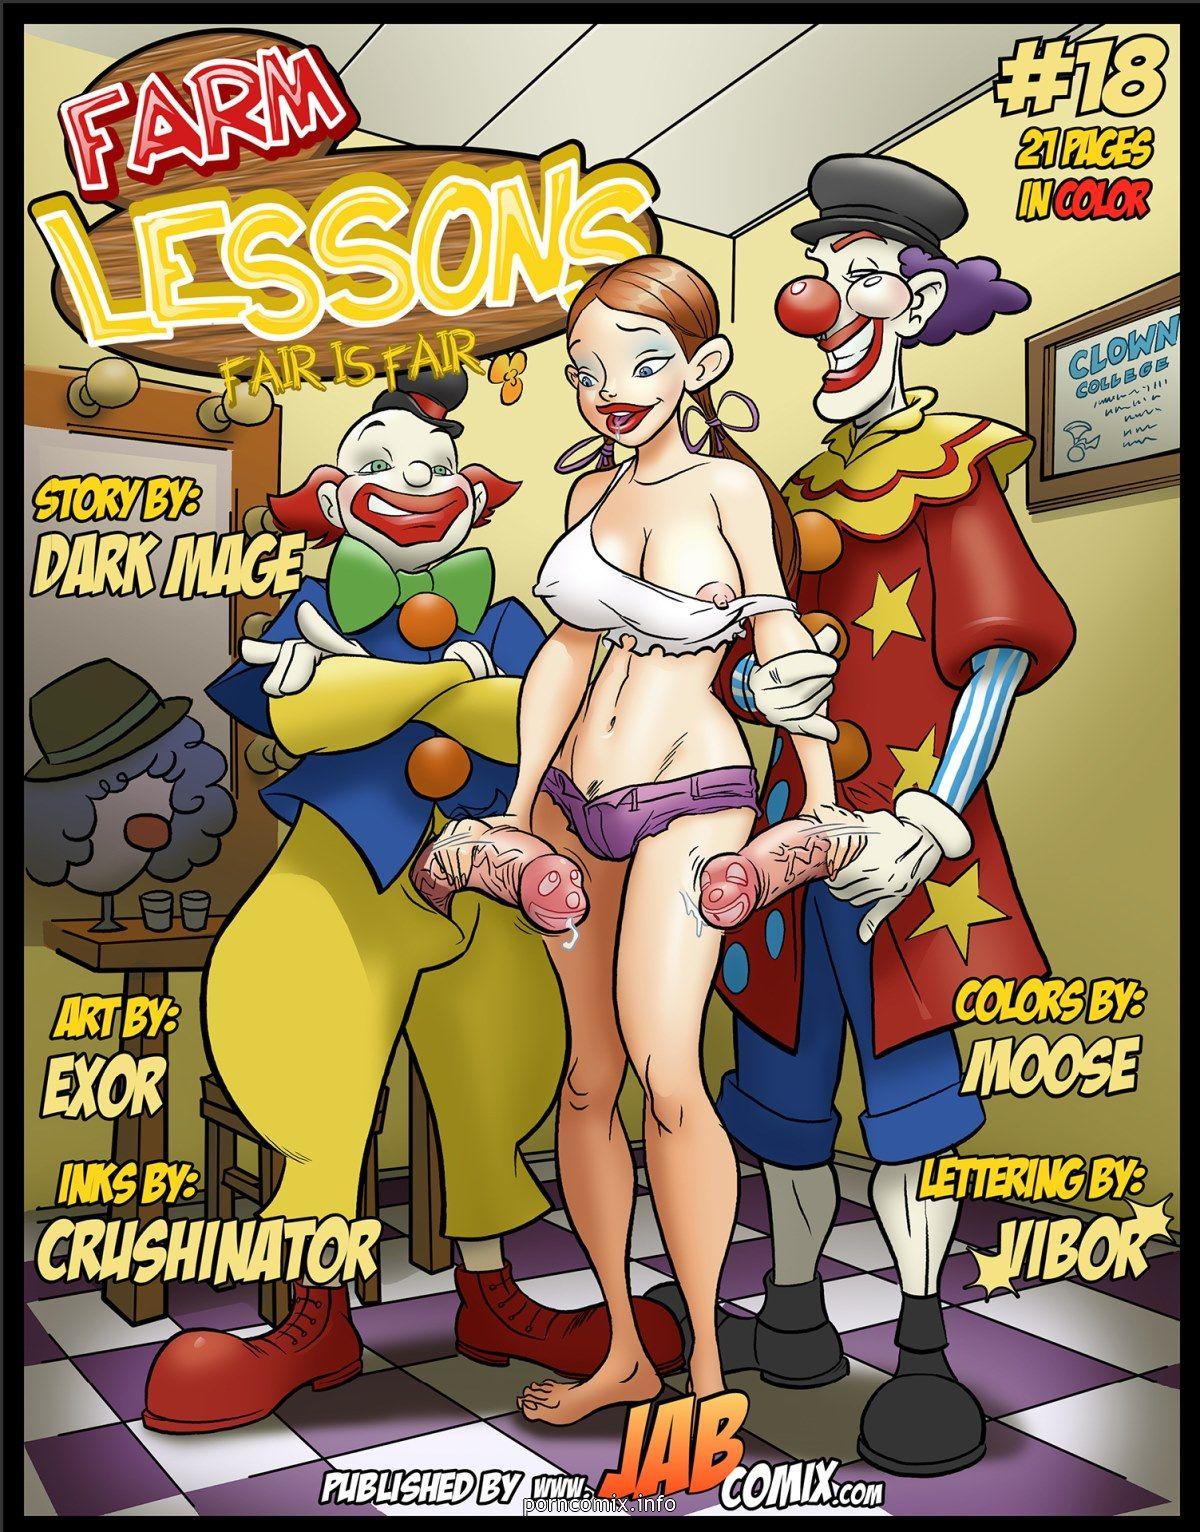 Farm Lessons Jab Comics Ideal farm lessons 18- jab comix   jab comixs covers   pinterest